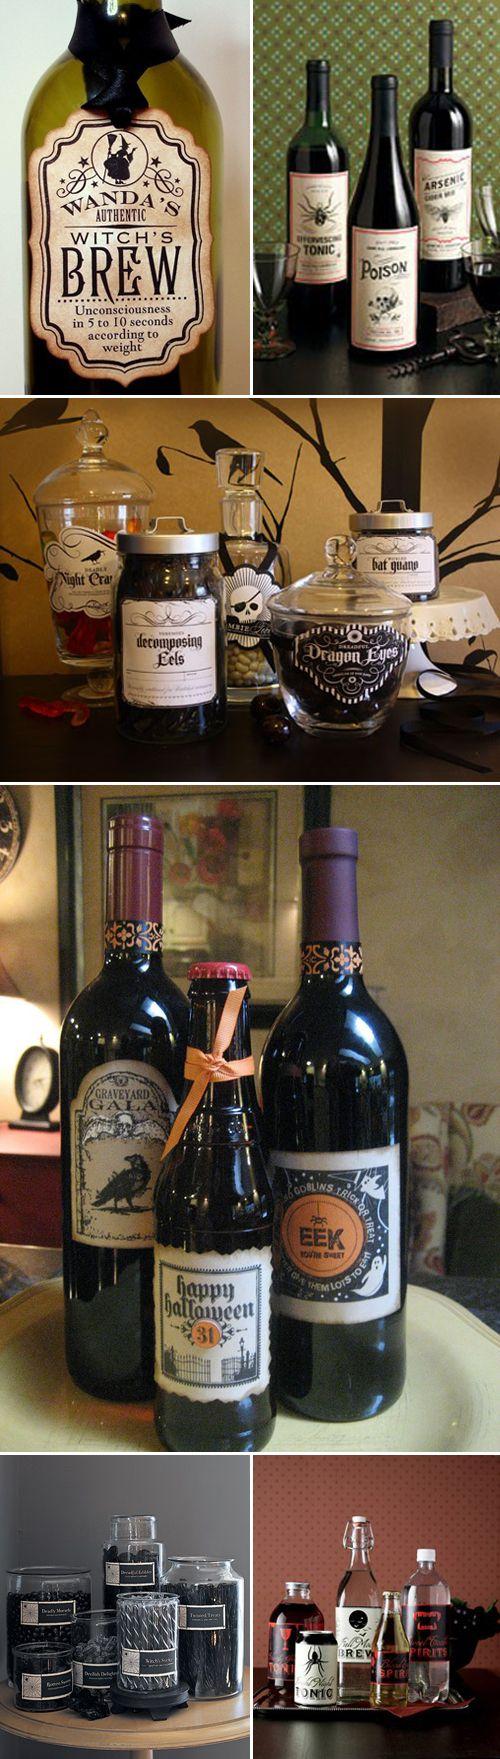 halloween labels for wine bottles